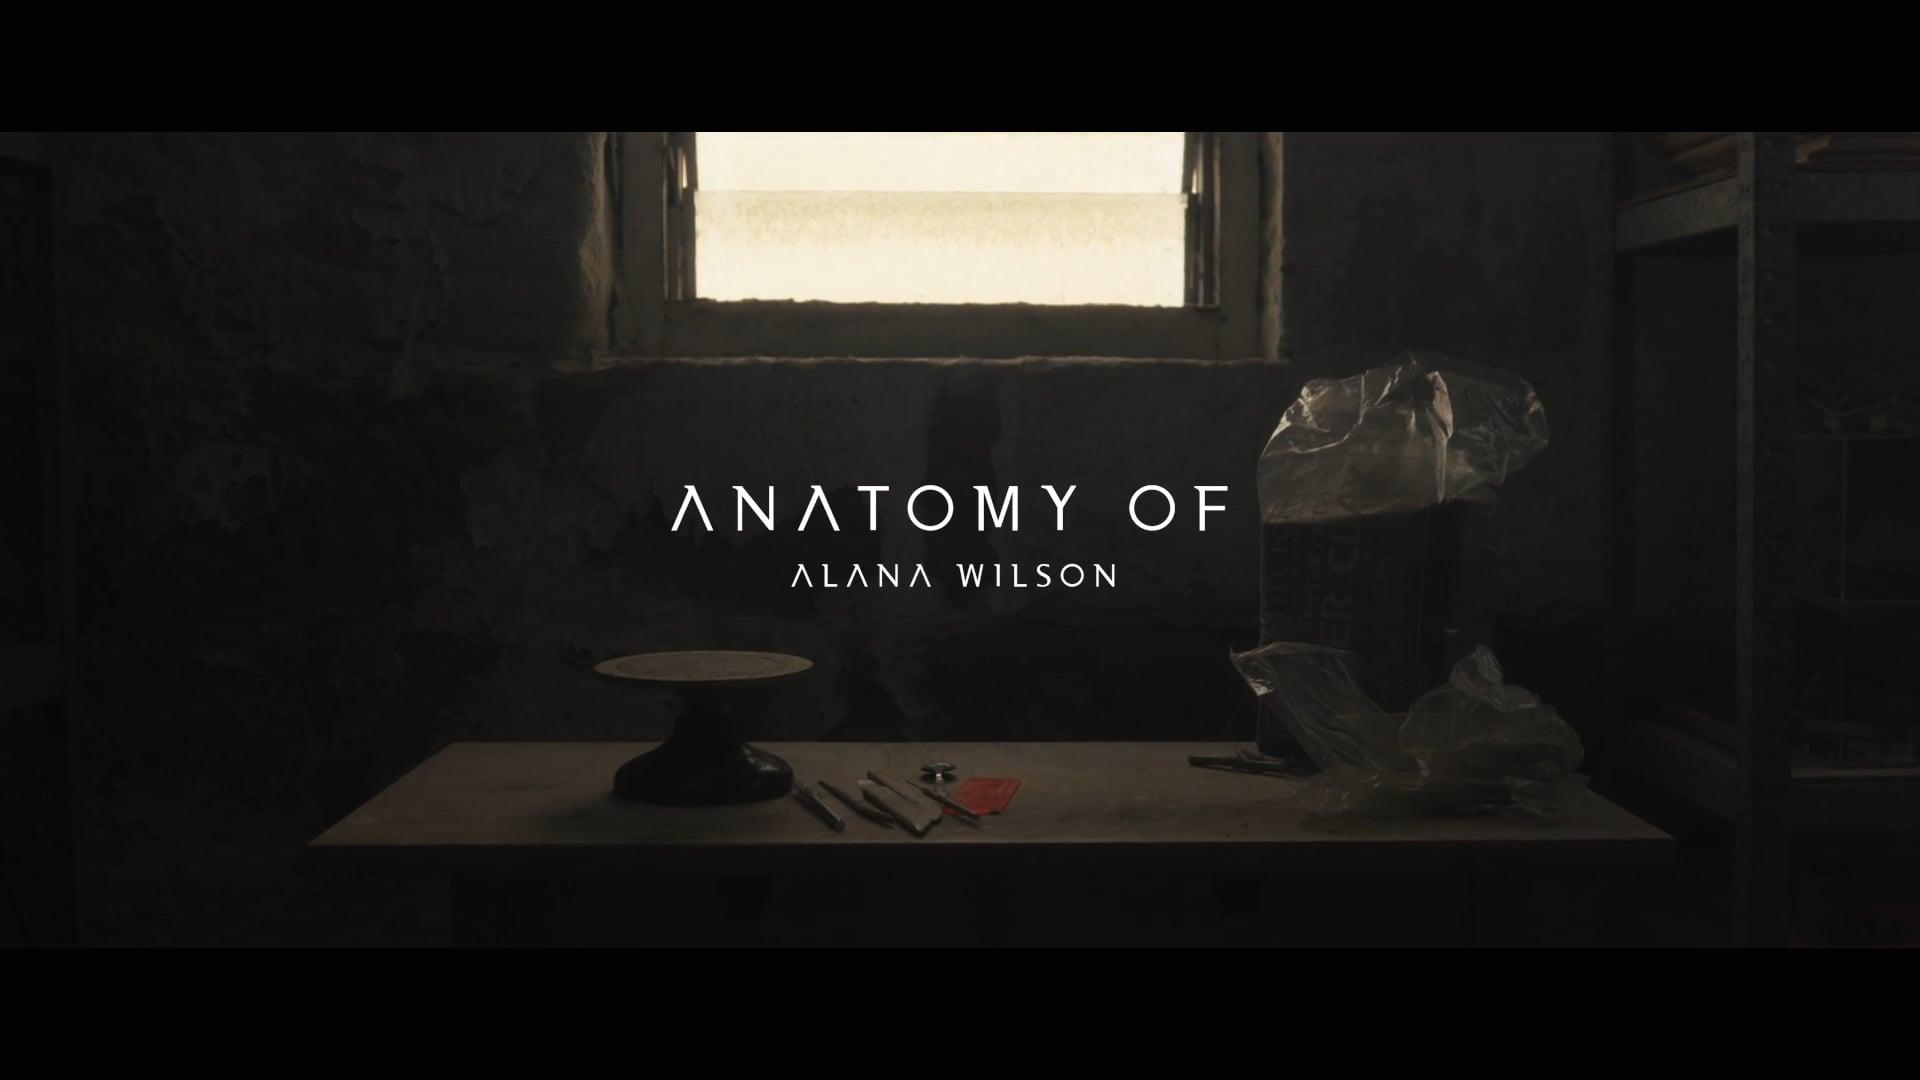 Anatomy of: Alana Wilson